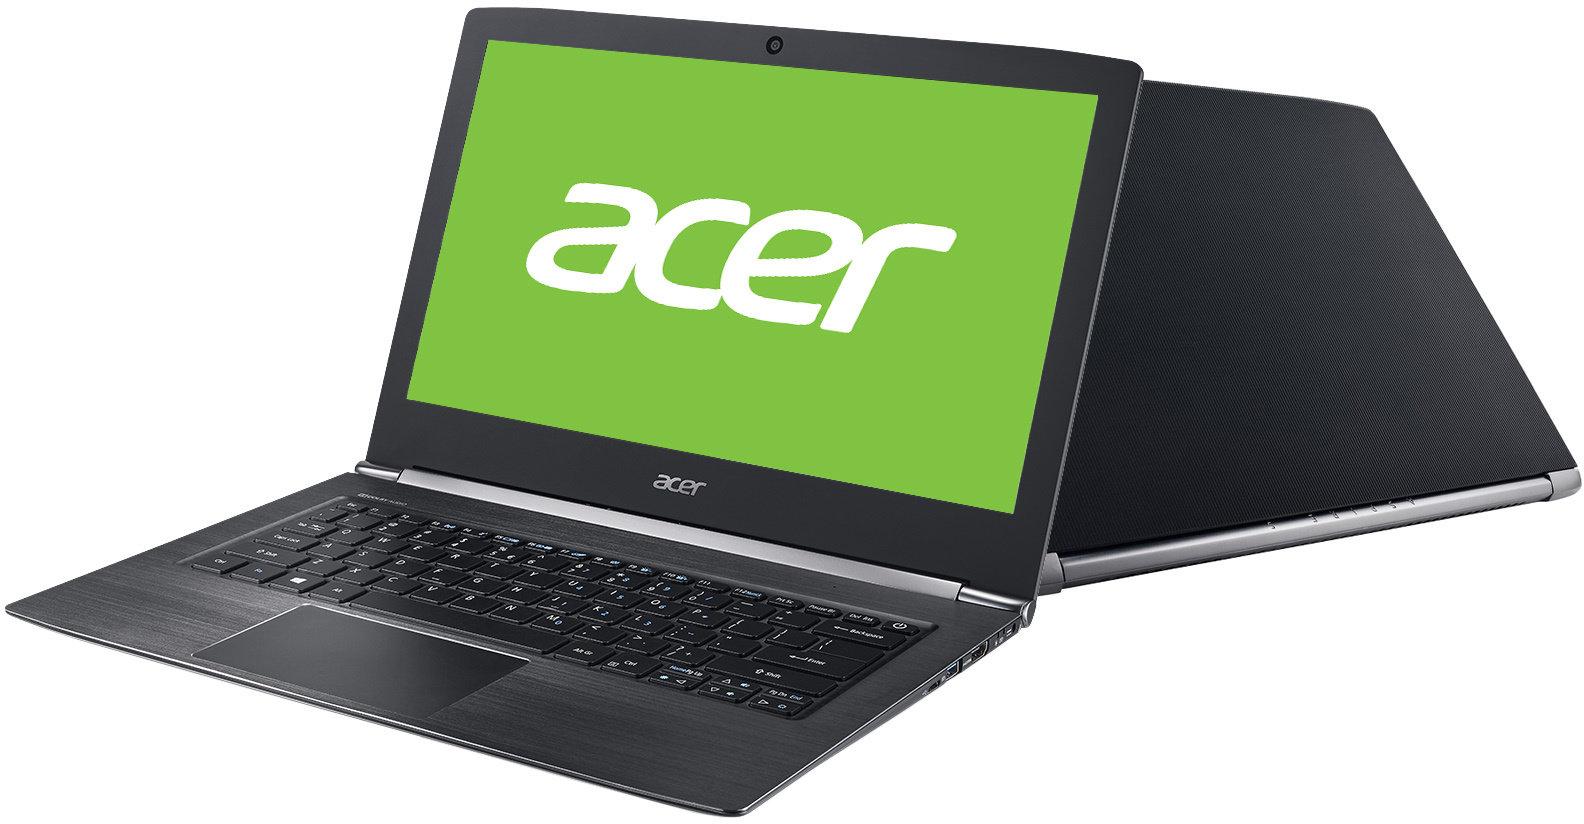 Acer Aspire S13 S5-371-54SH